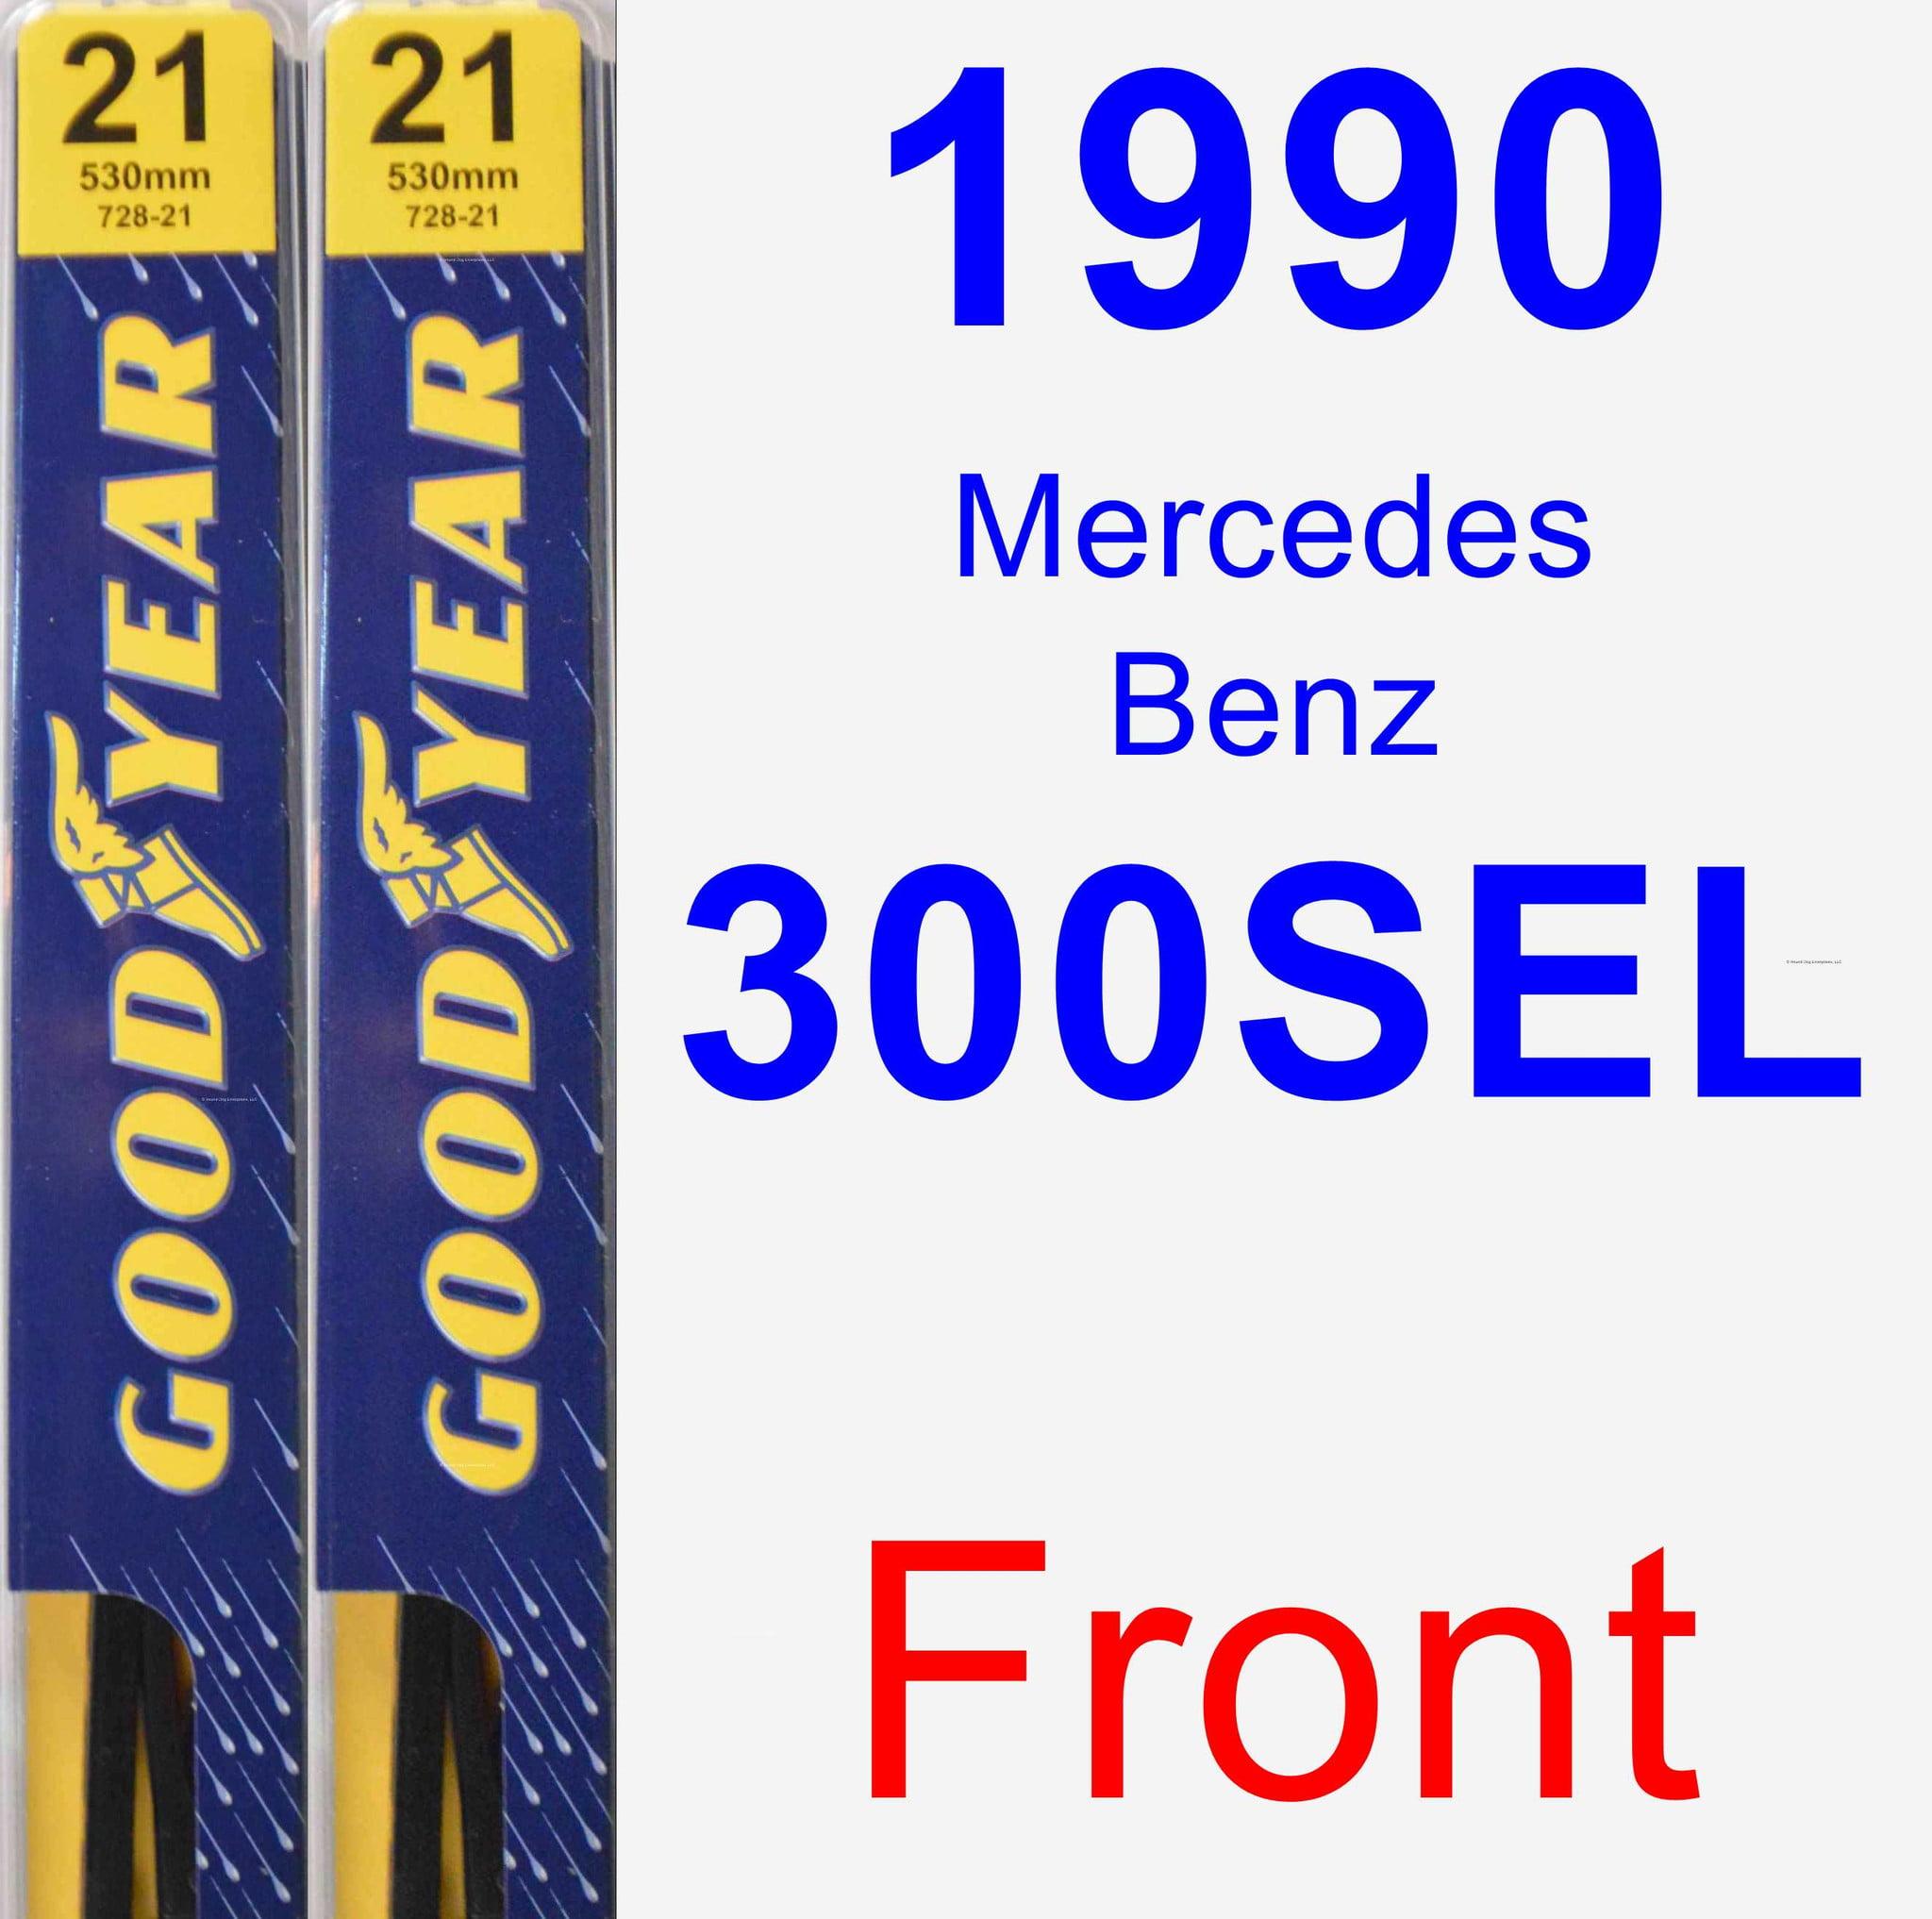 1990 Mercedes-Benz 300SEL Wiper Blade Set/Kit (Front) (2 Blades) - Premium